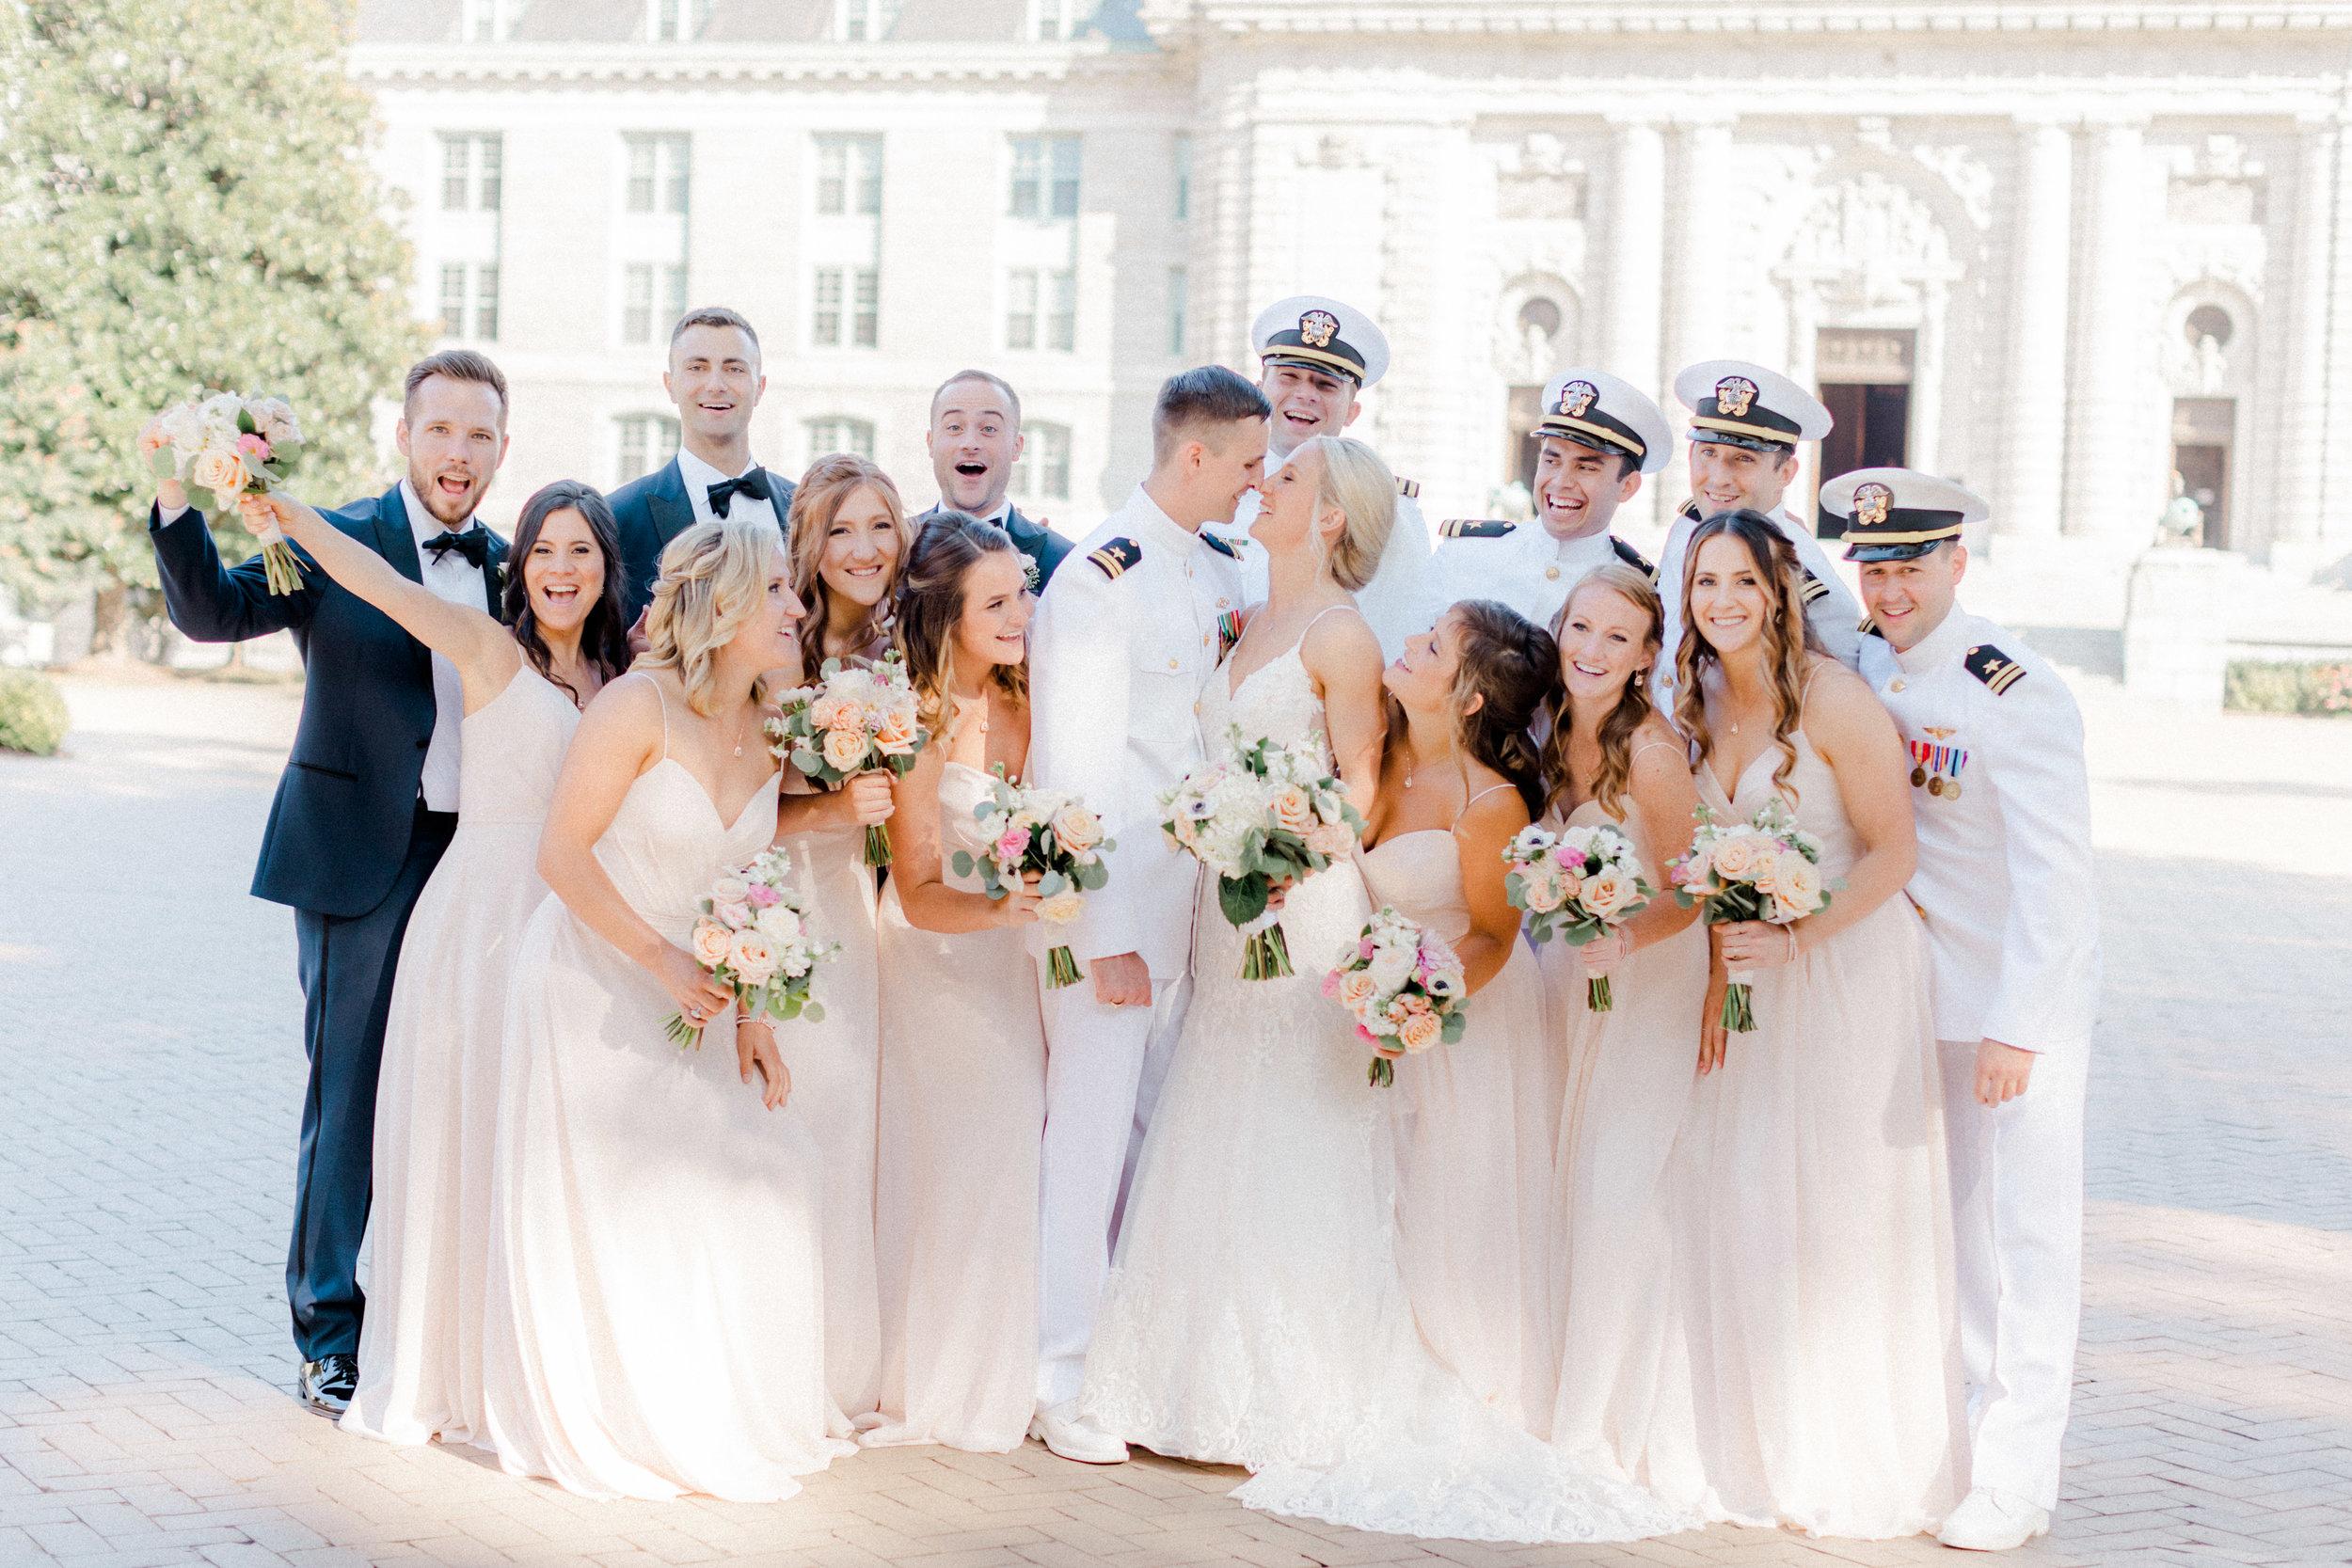 annapolis-wedding-photographer-hannah-lane-photography-1696 - Copy.jpg